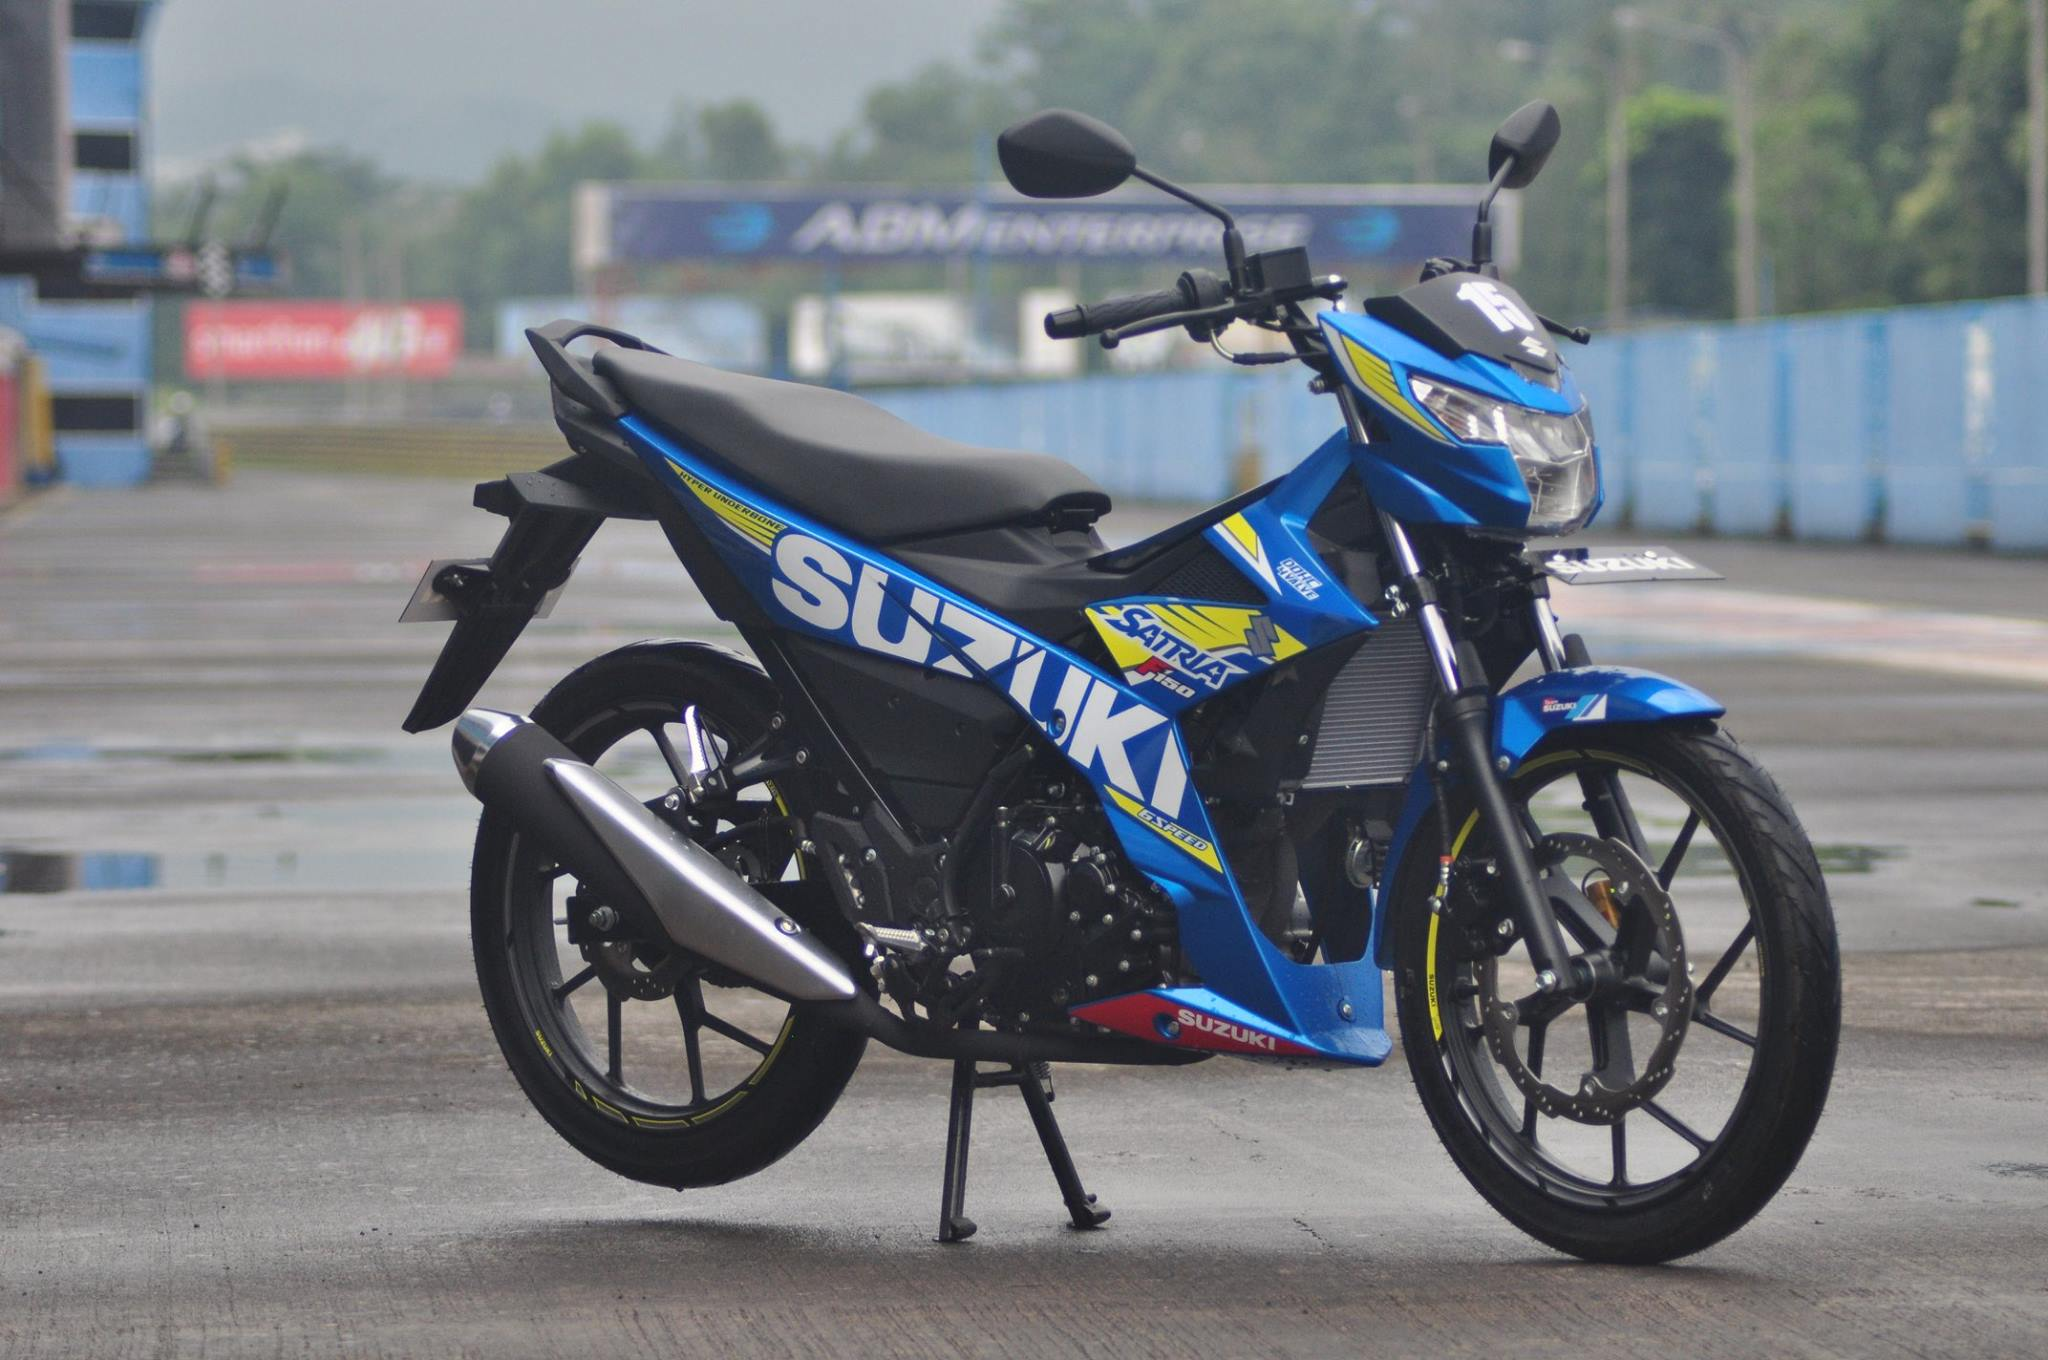 Suzuki Satria